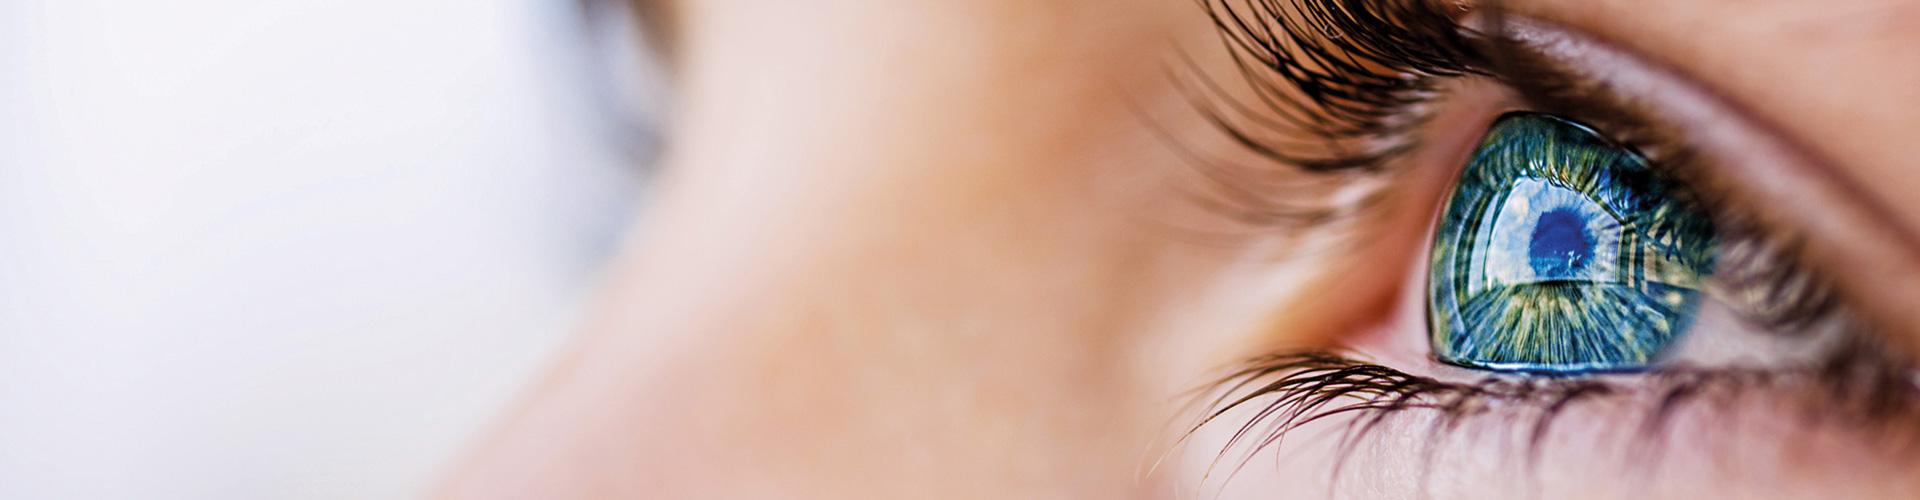 Kopp-Kirsamer - Slider groß Gesicht Auge